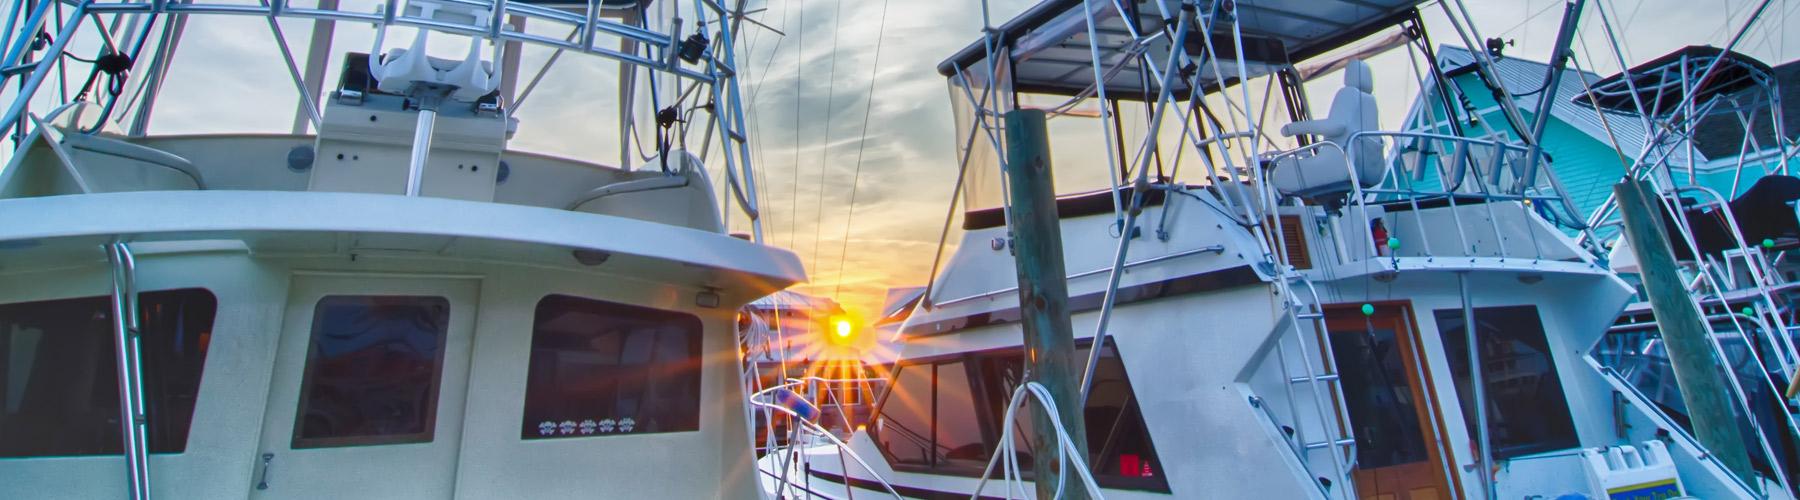 Myrtle Beach Fishing Boats